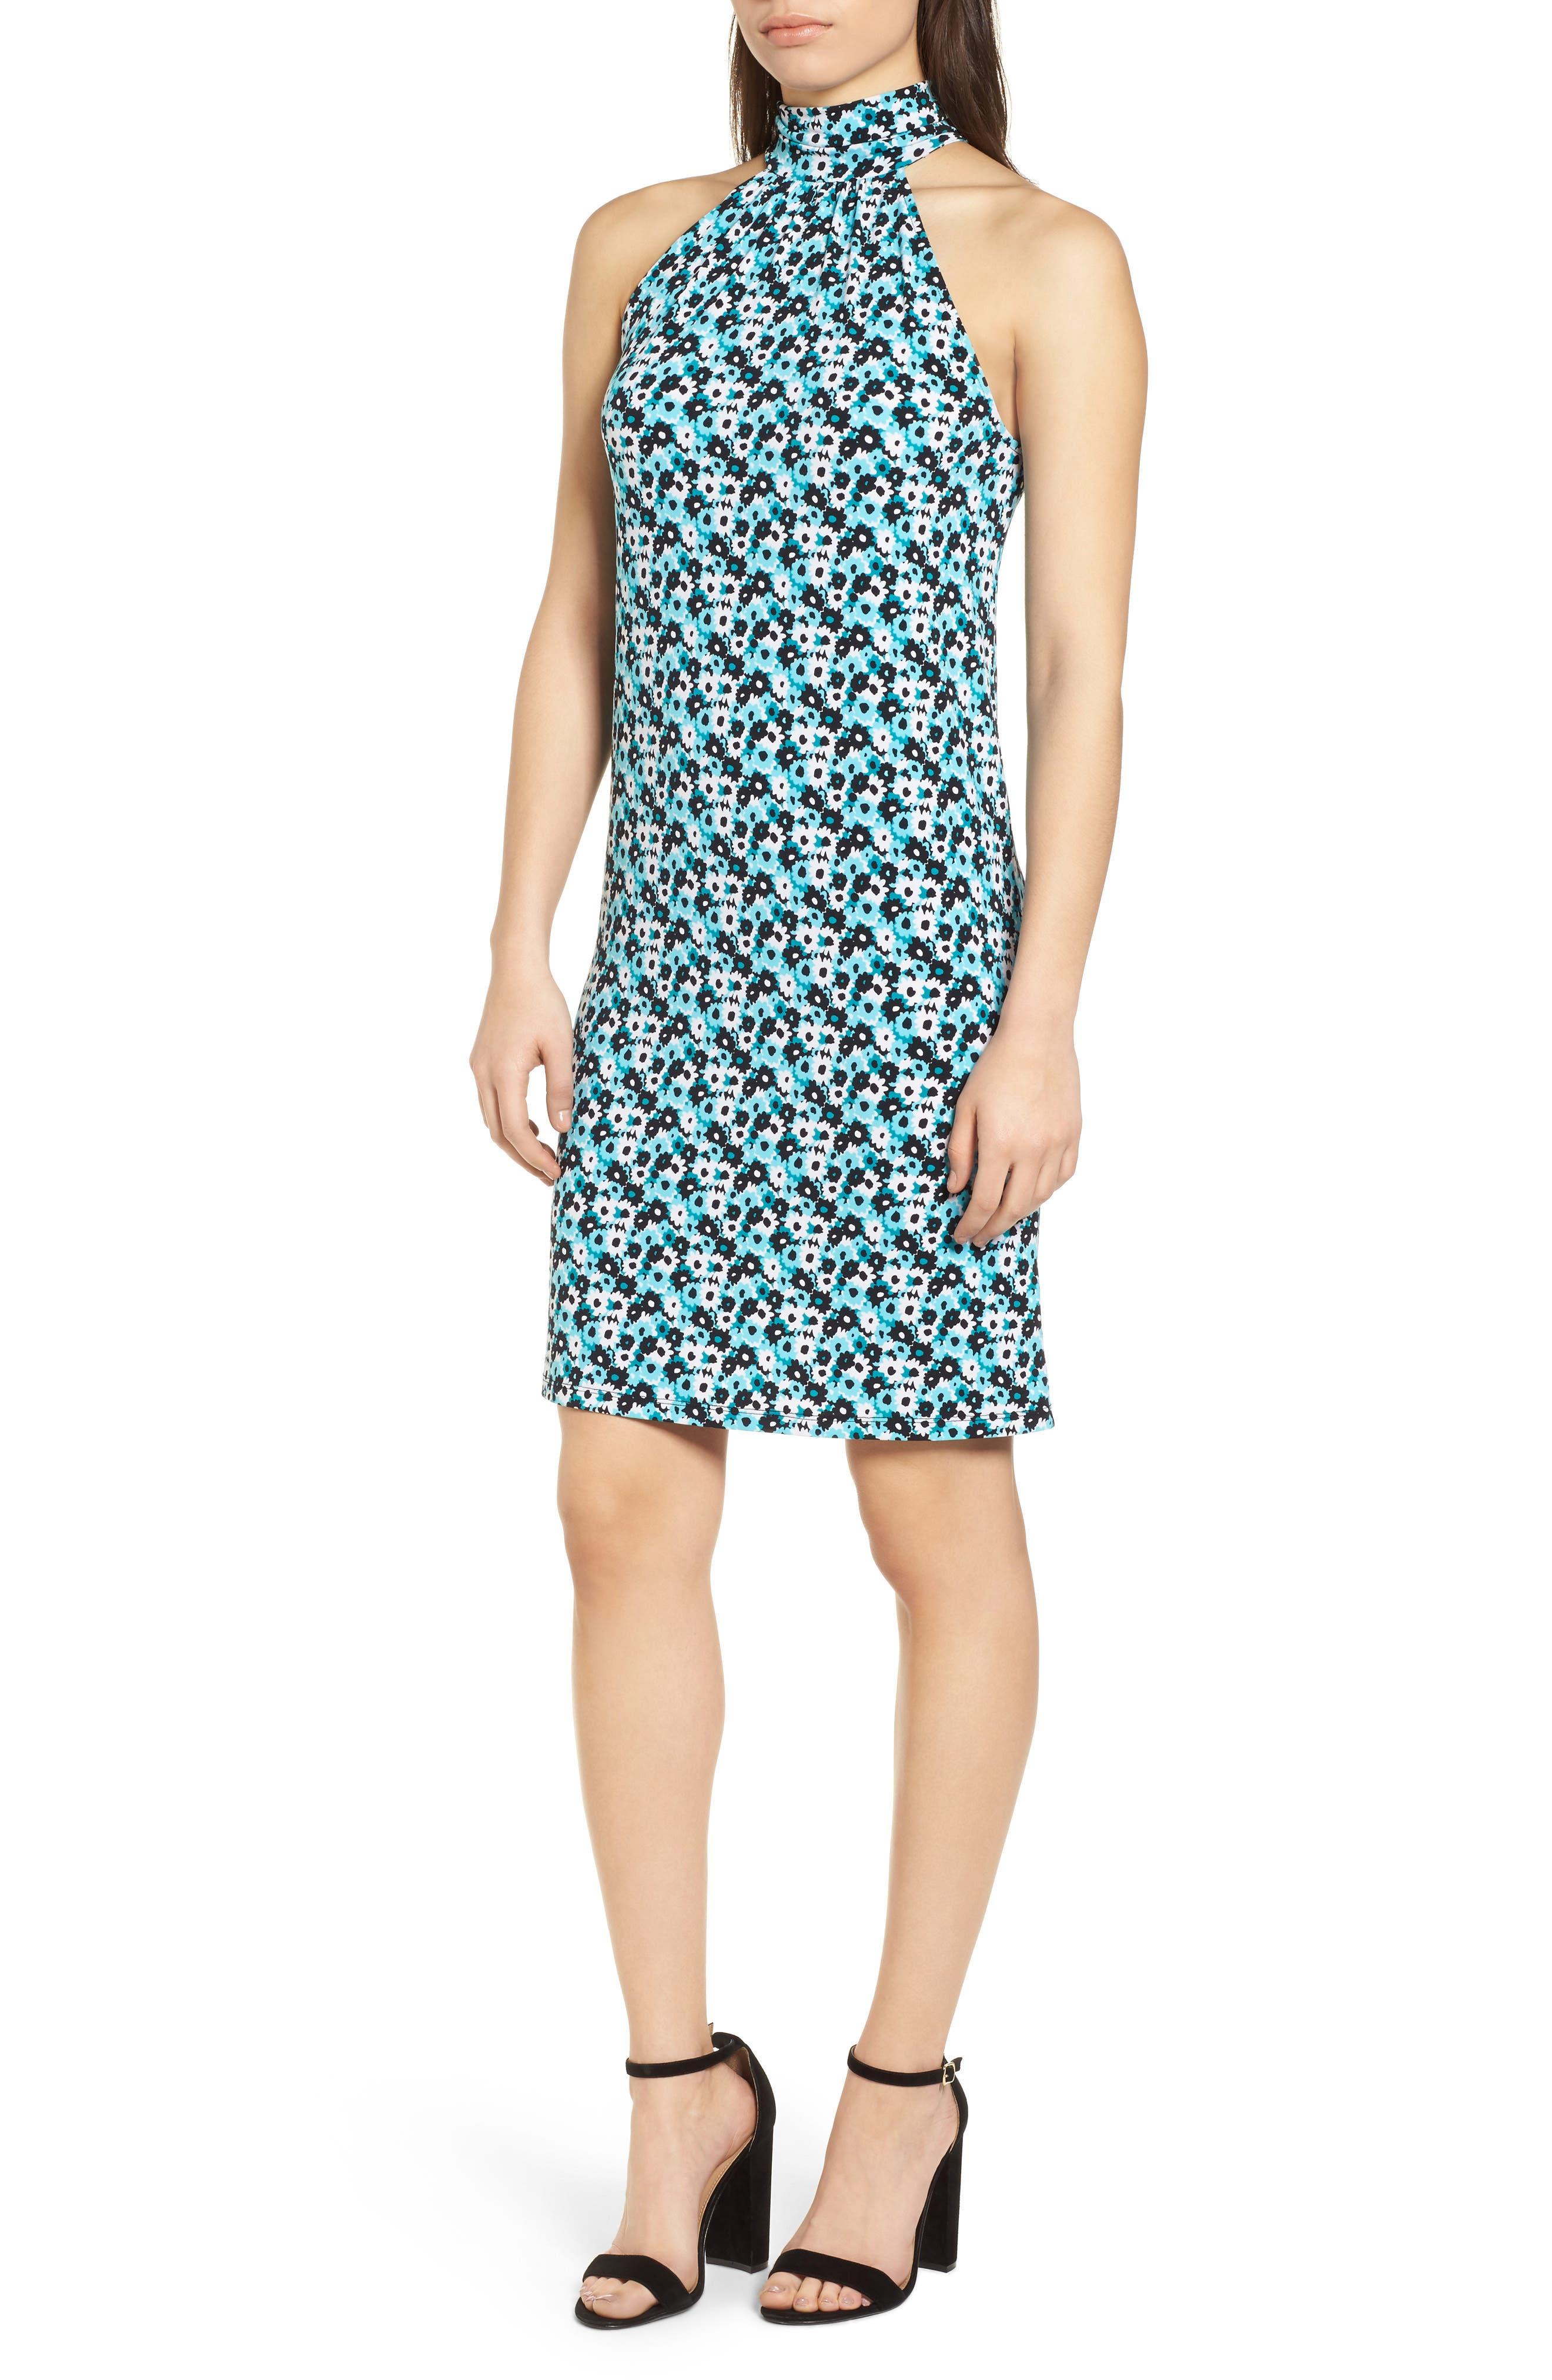 Carnation Sleeveless Dress,                         Main,                         color,